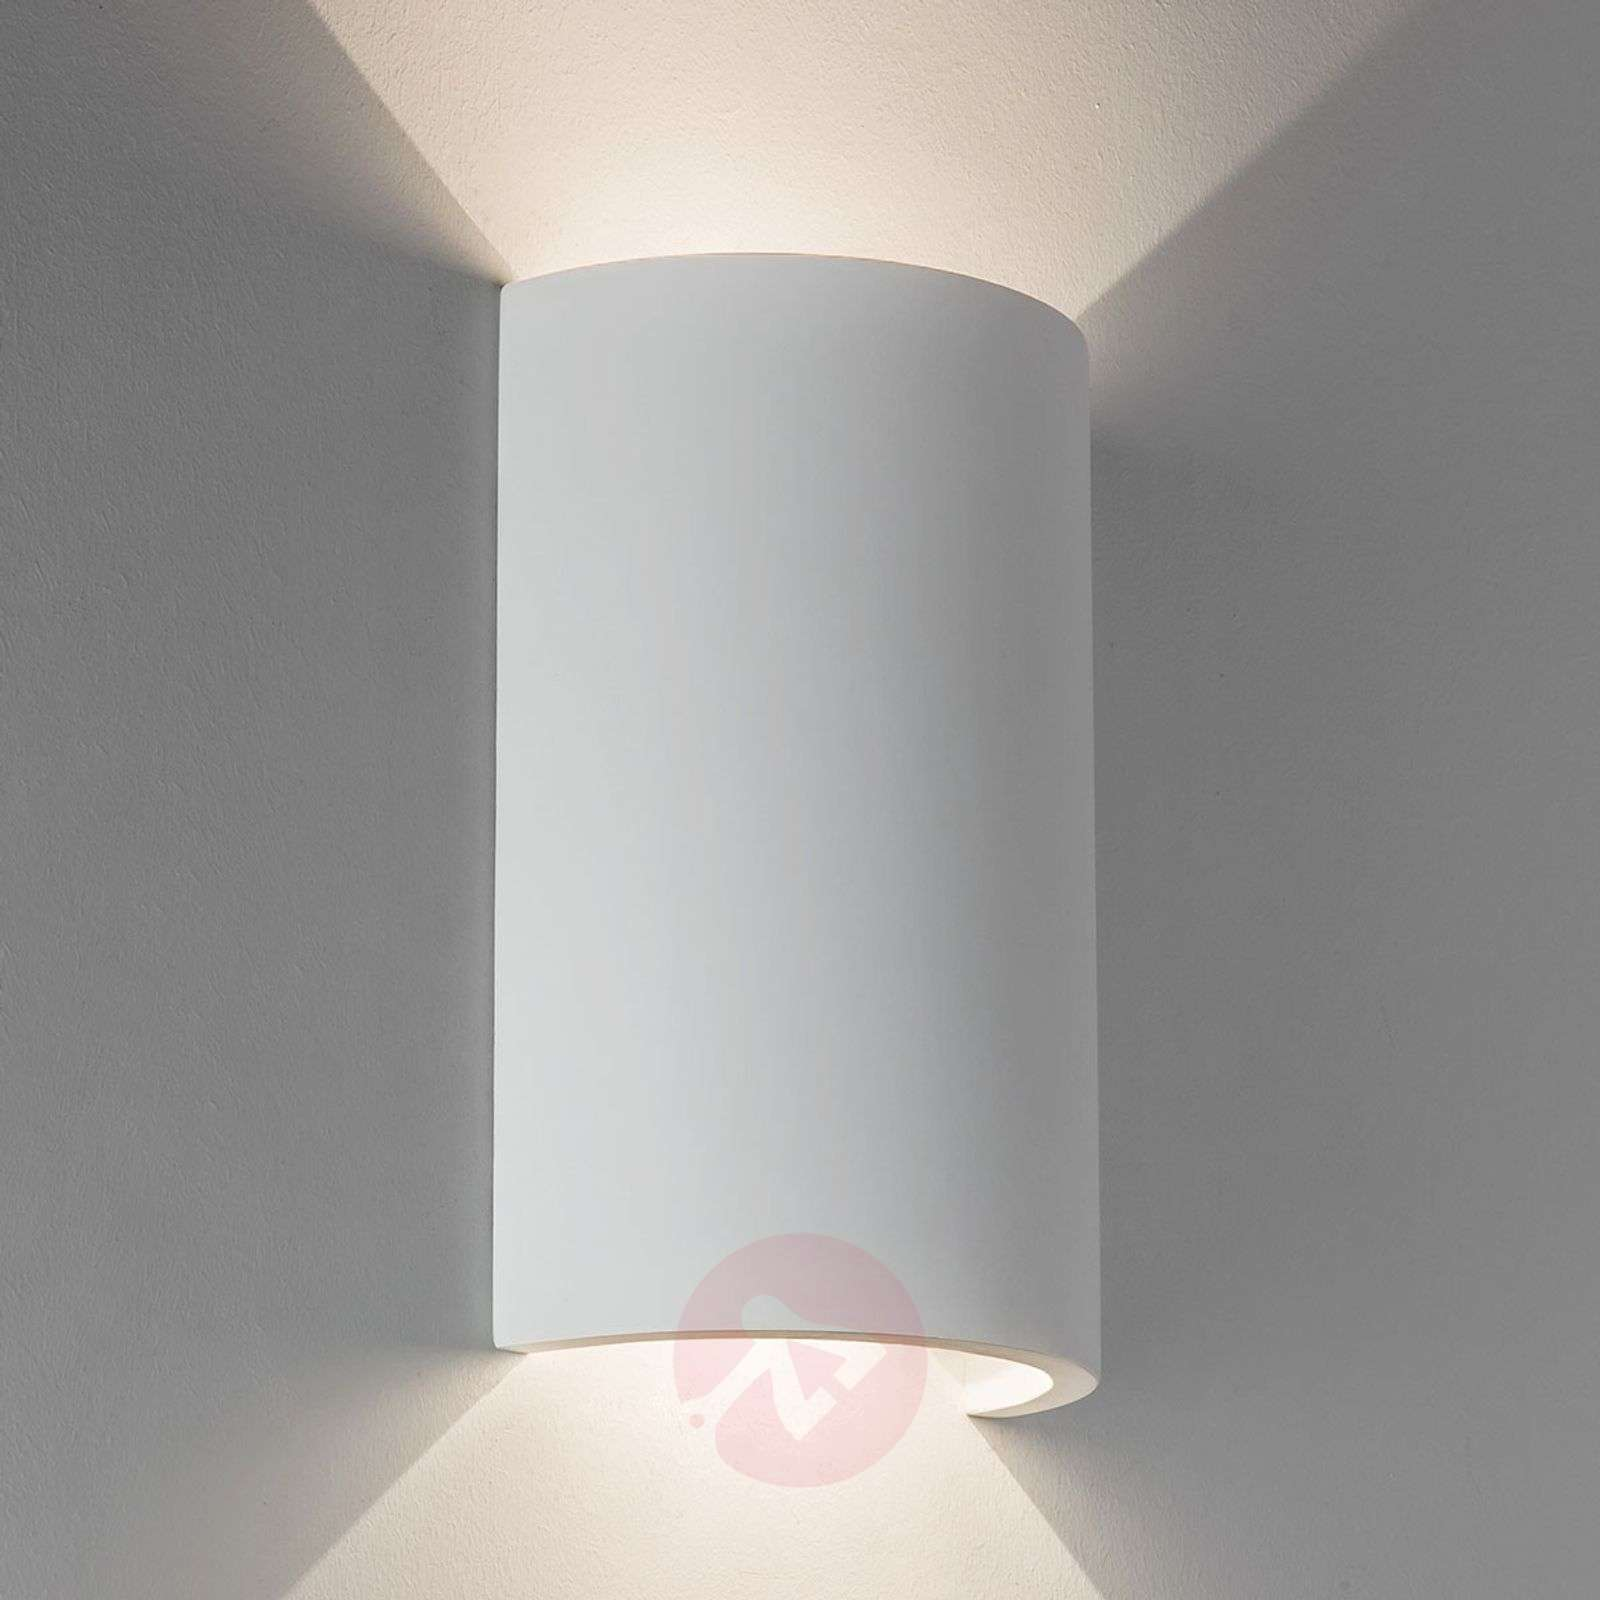 Paintable Serifos Led Wall Light 170 Plaster 1020588 01